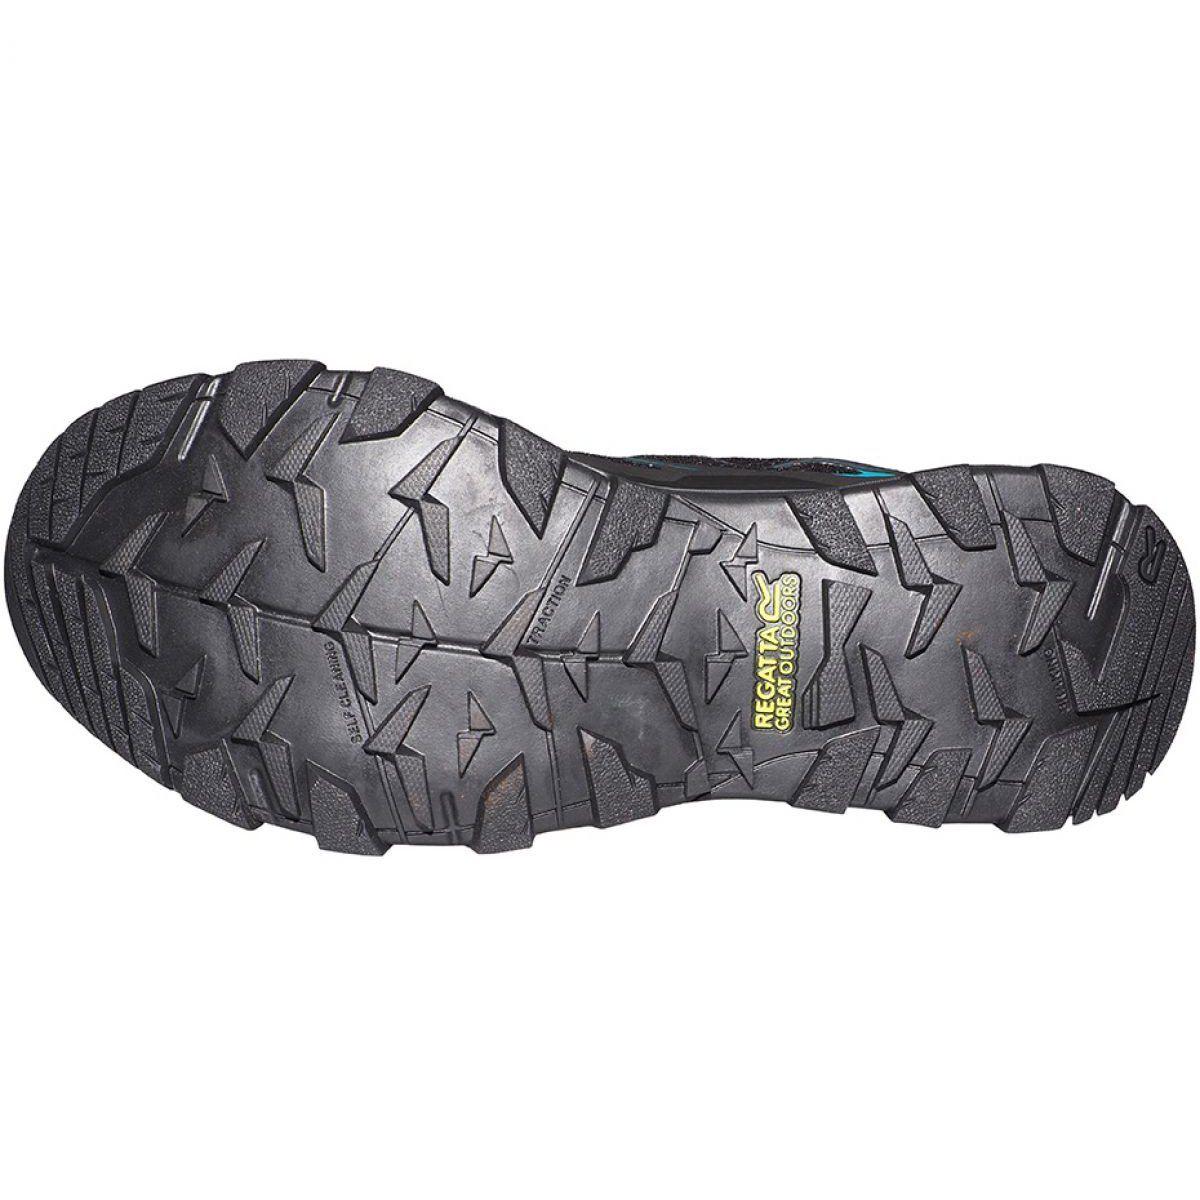 Buty Regatta Wms Kota Low W Rwf489 41qf Regatta Shoes Sneakers